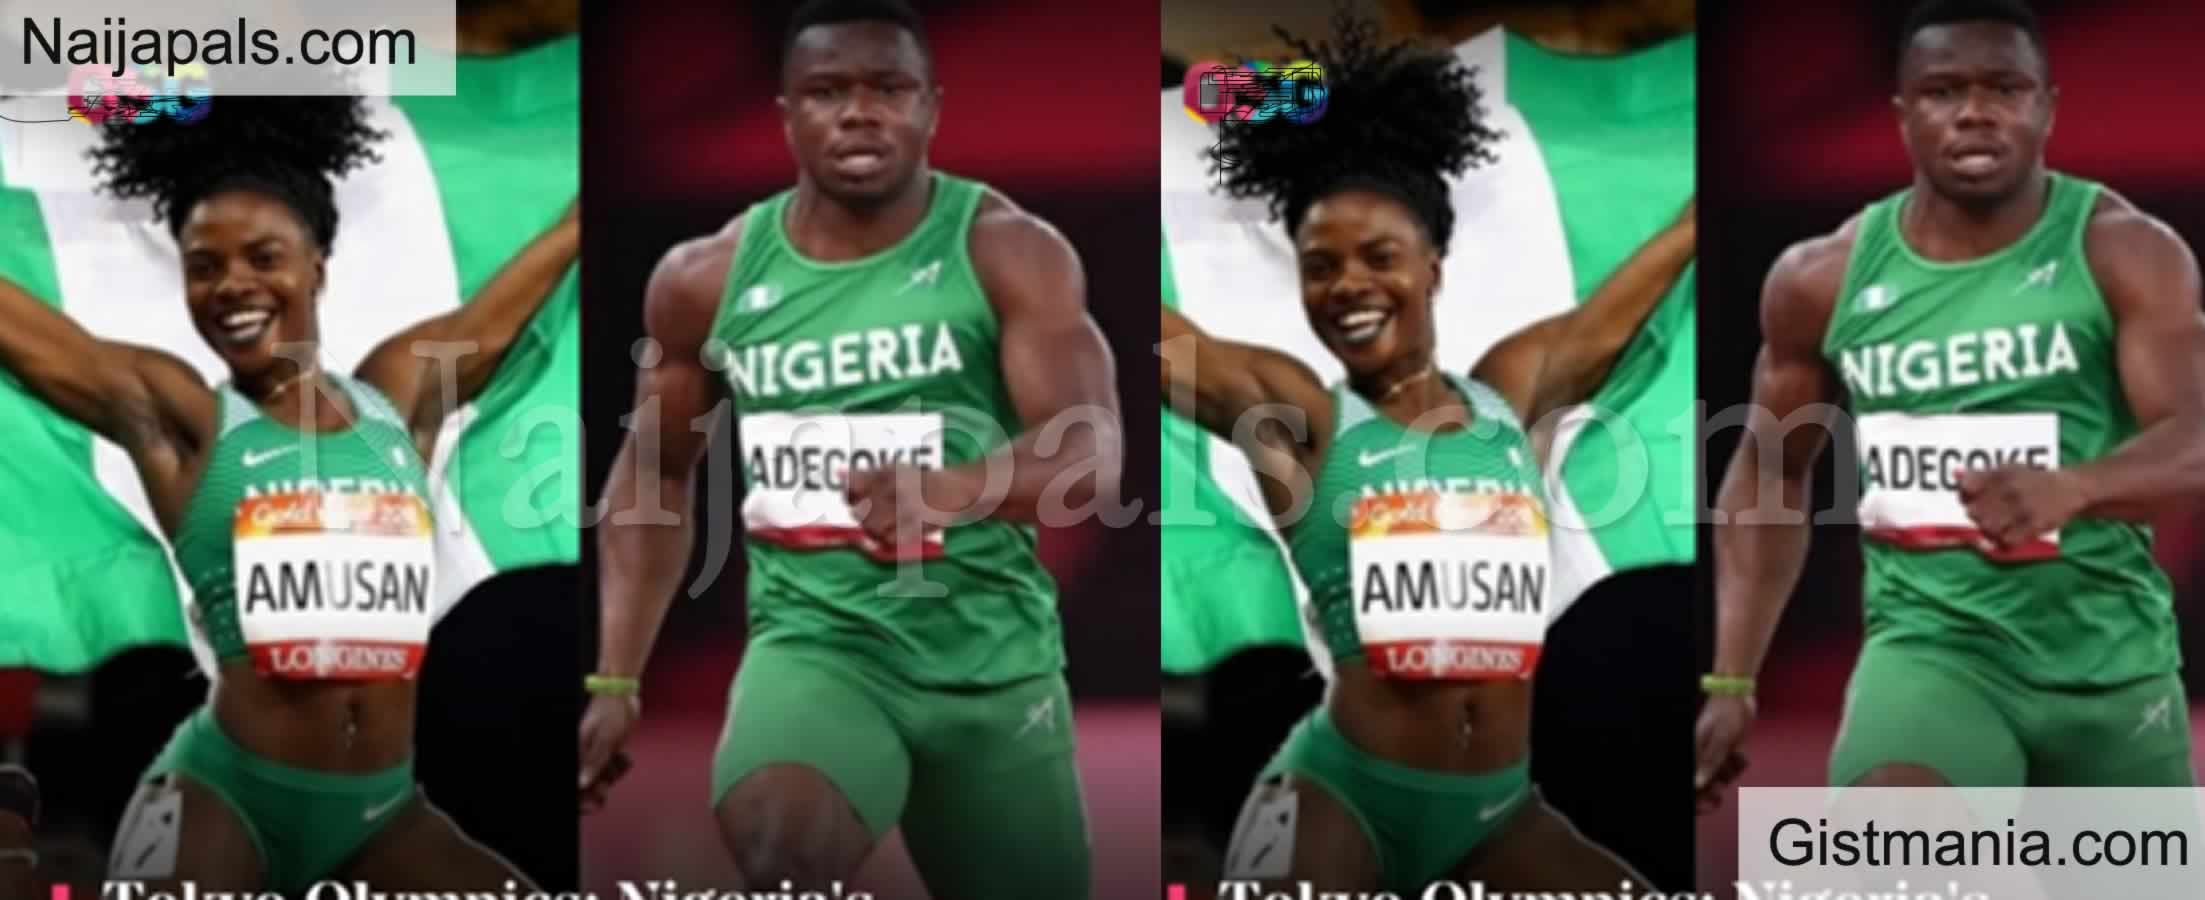 <img alt='.' class='lazyload' data-src='https://img.gistmania.com/emot/news.gif' /> Tokyo Olympics: <b>Nigeria's Athletes, Amusan And Adegoke, Break Records</b>